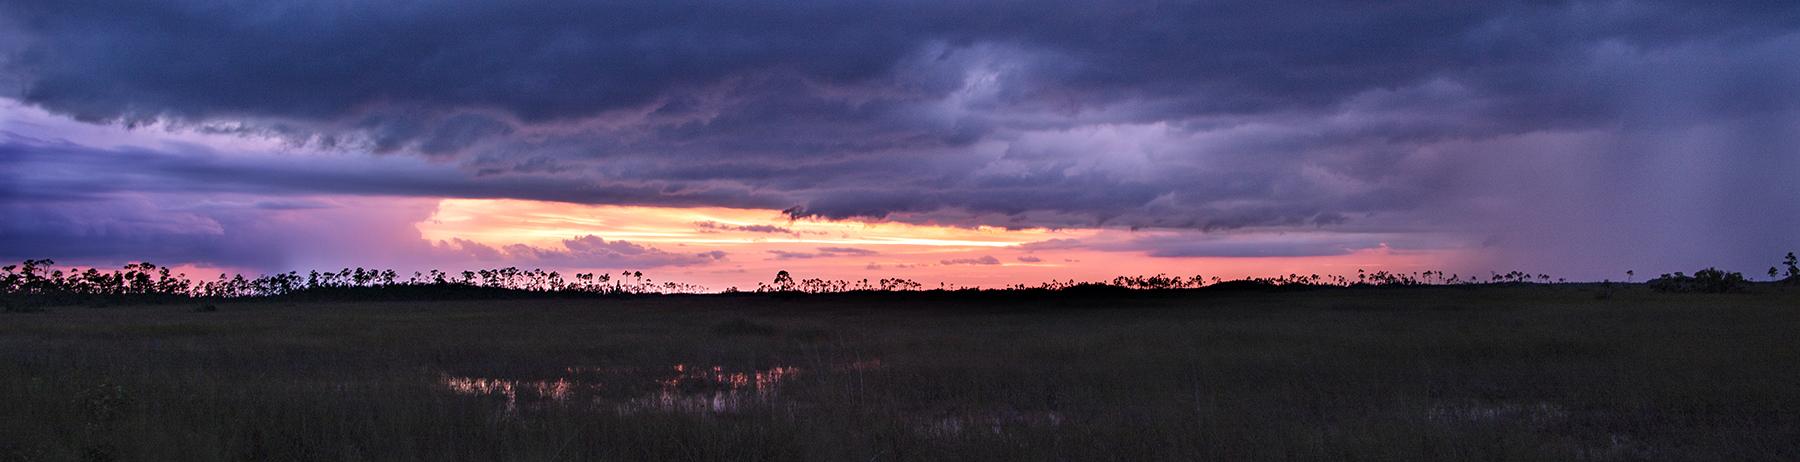 Mahogany Hammock Road Sunset 01.jpg